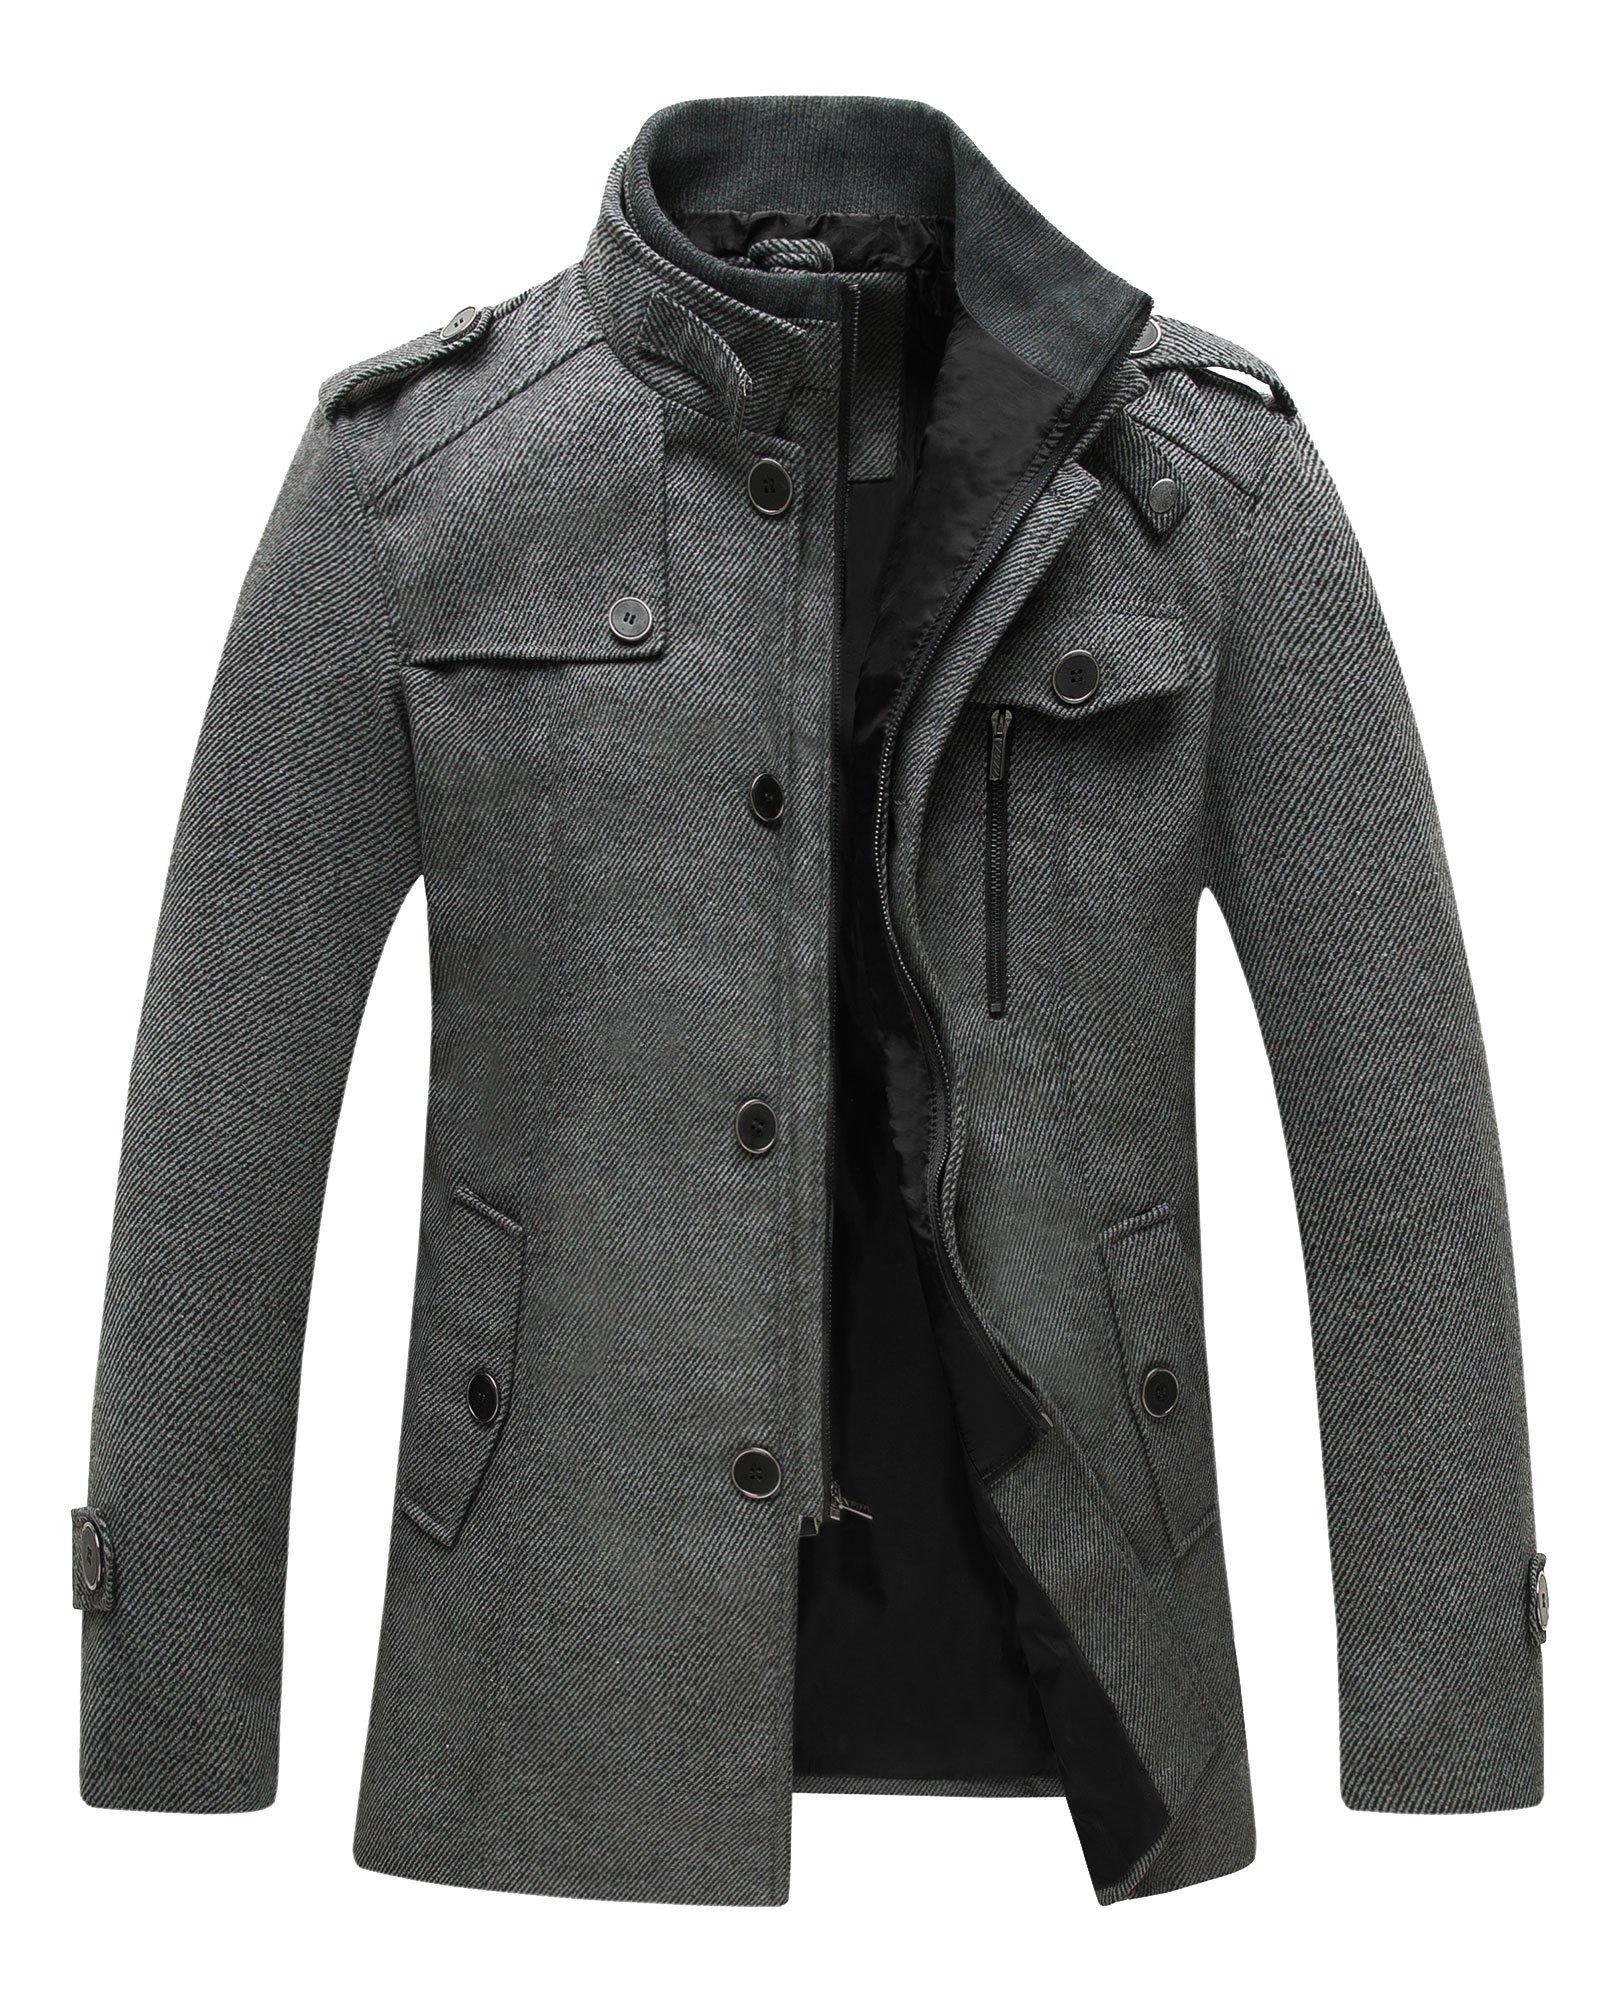 Wantdo Men's Wool Coat Stand Collar Windproof Jacket Overcoat Grey Large by Wantdo (Image #1)